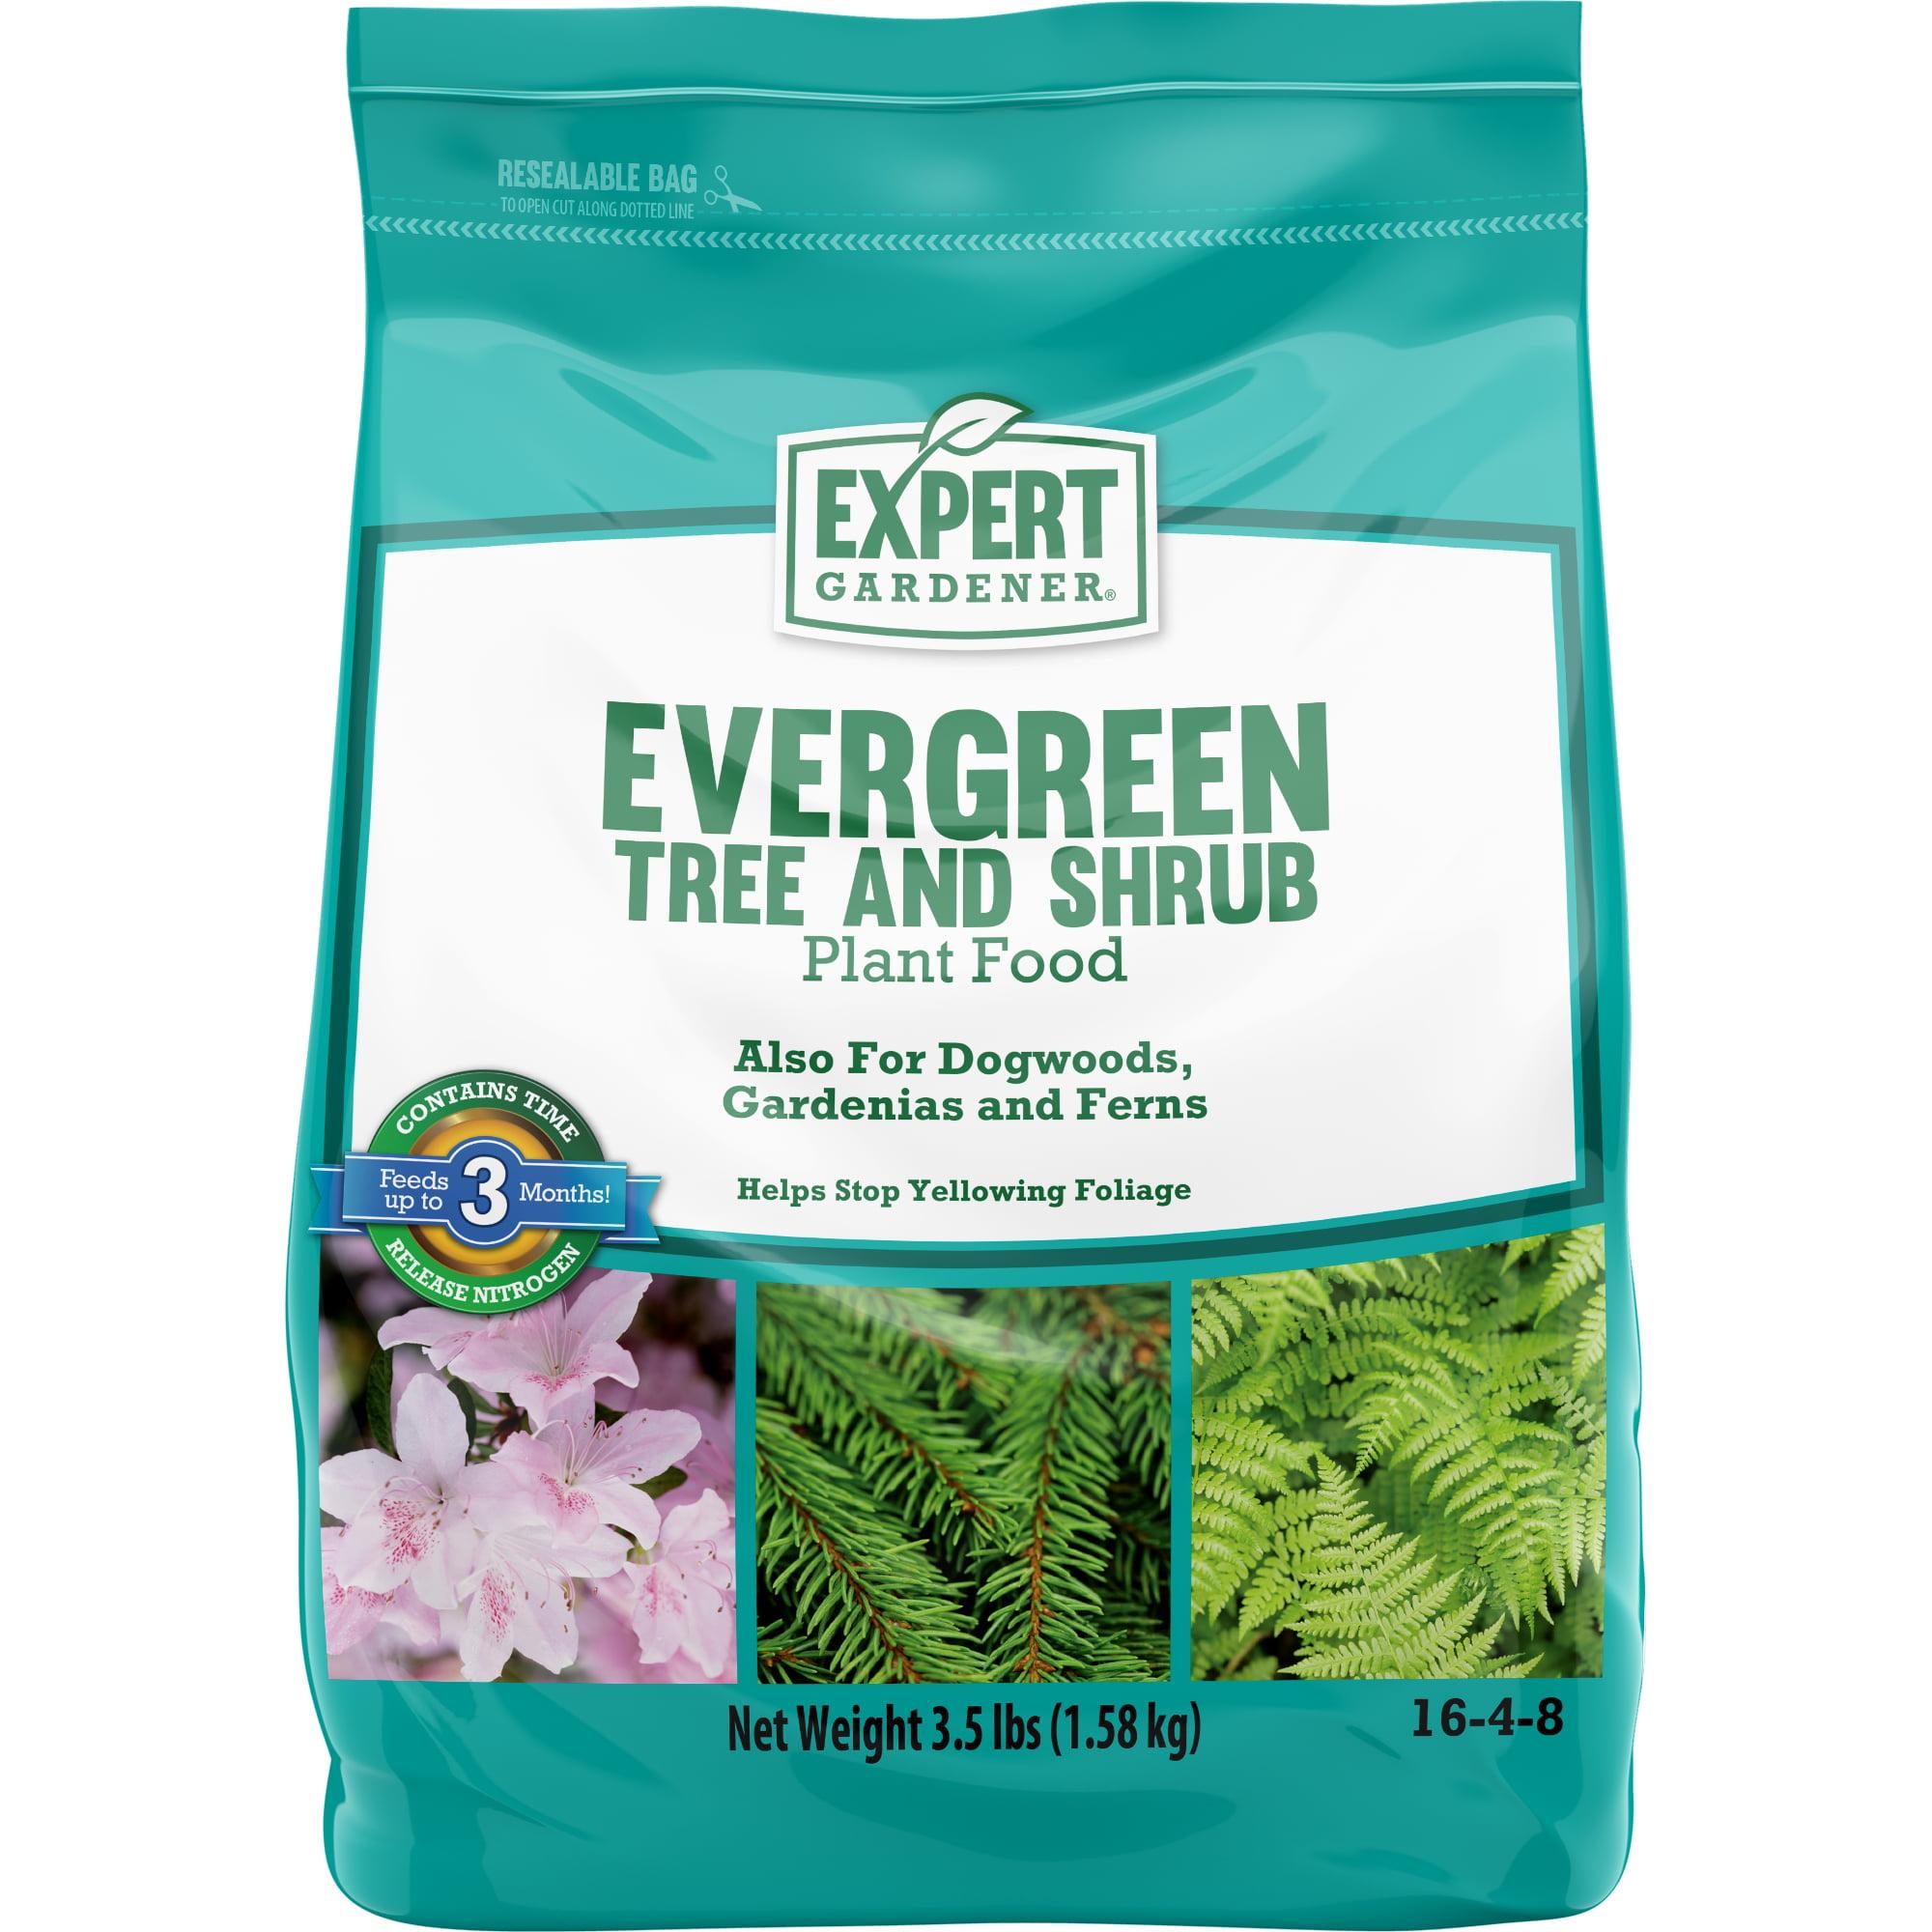 Expert Gardener Evergreen Tree and Shrub Plant Food 16-4-8; 3.5 Pounds